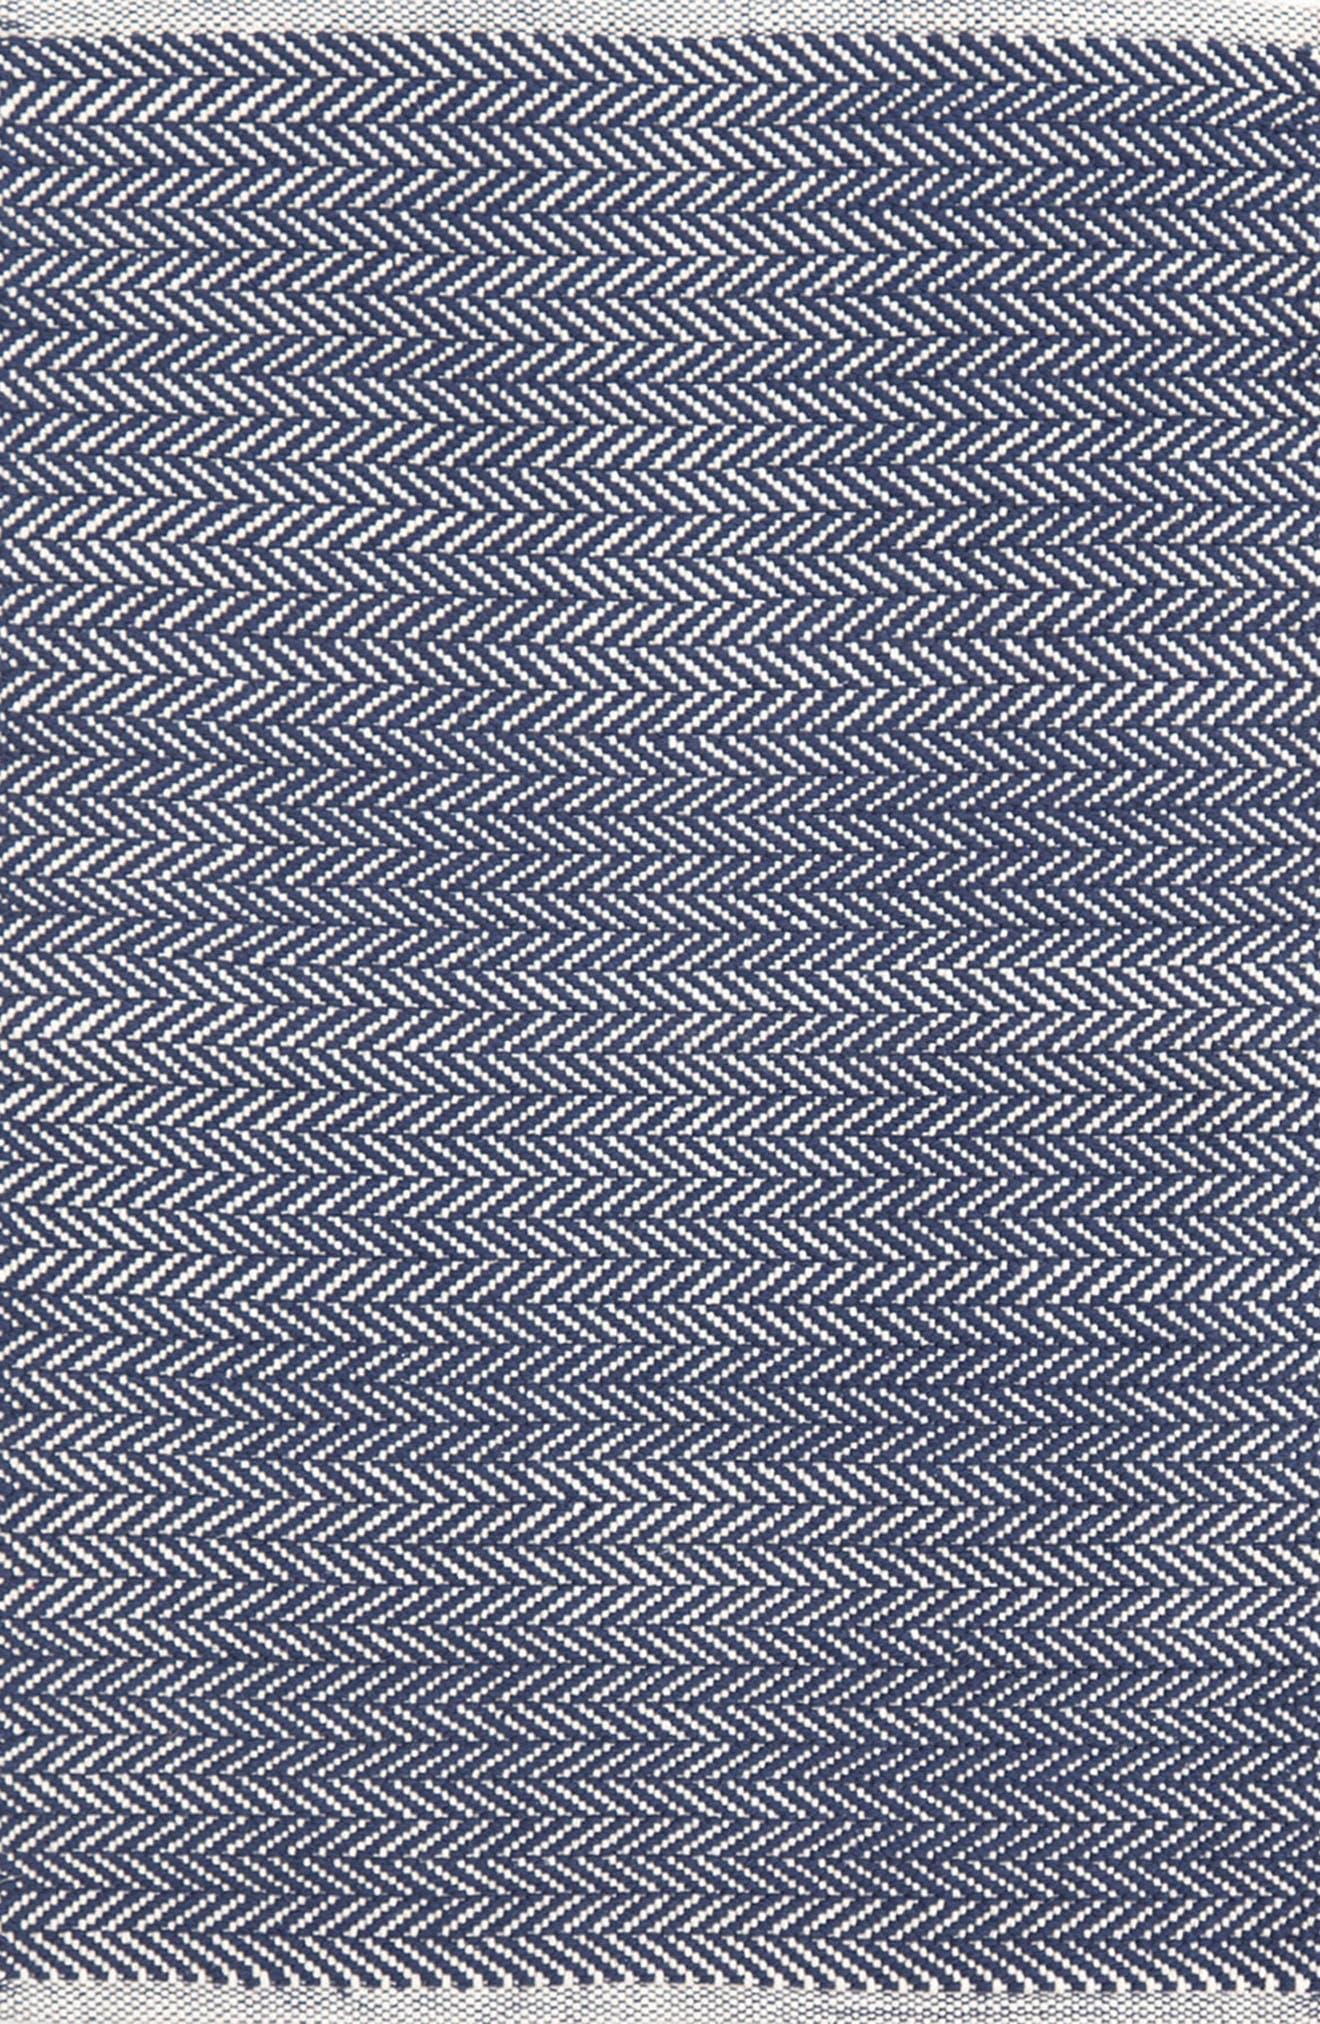 Alternate Image 1 Selected - Dash & Albert Herringbone Indoor/Outdoor Rug